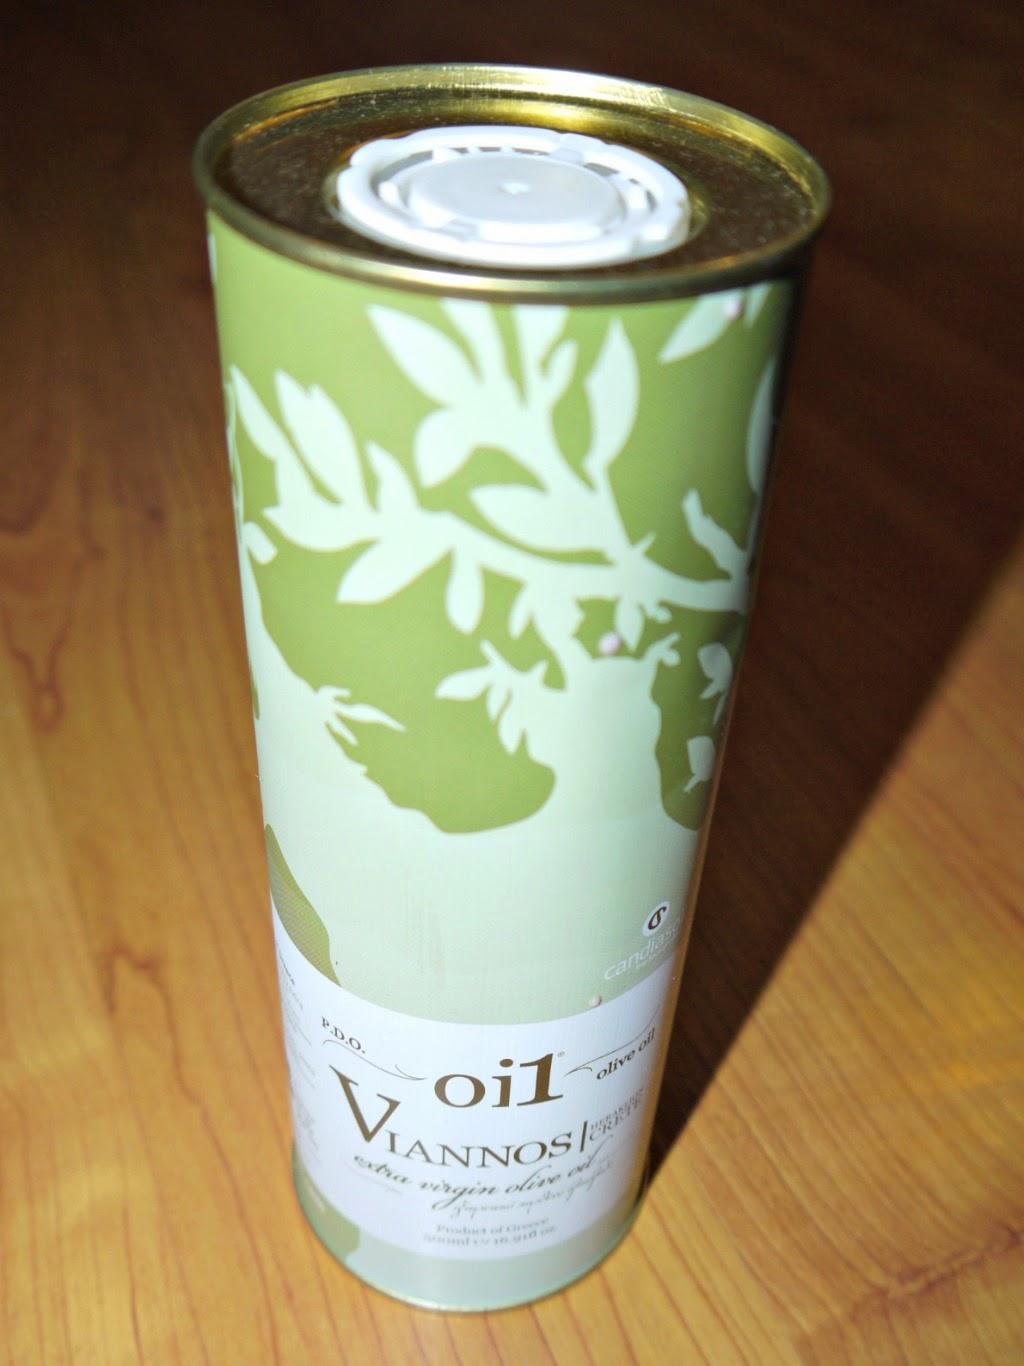 Oi1, olive oil